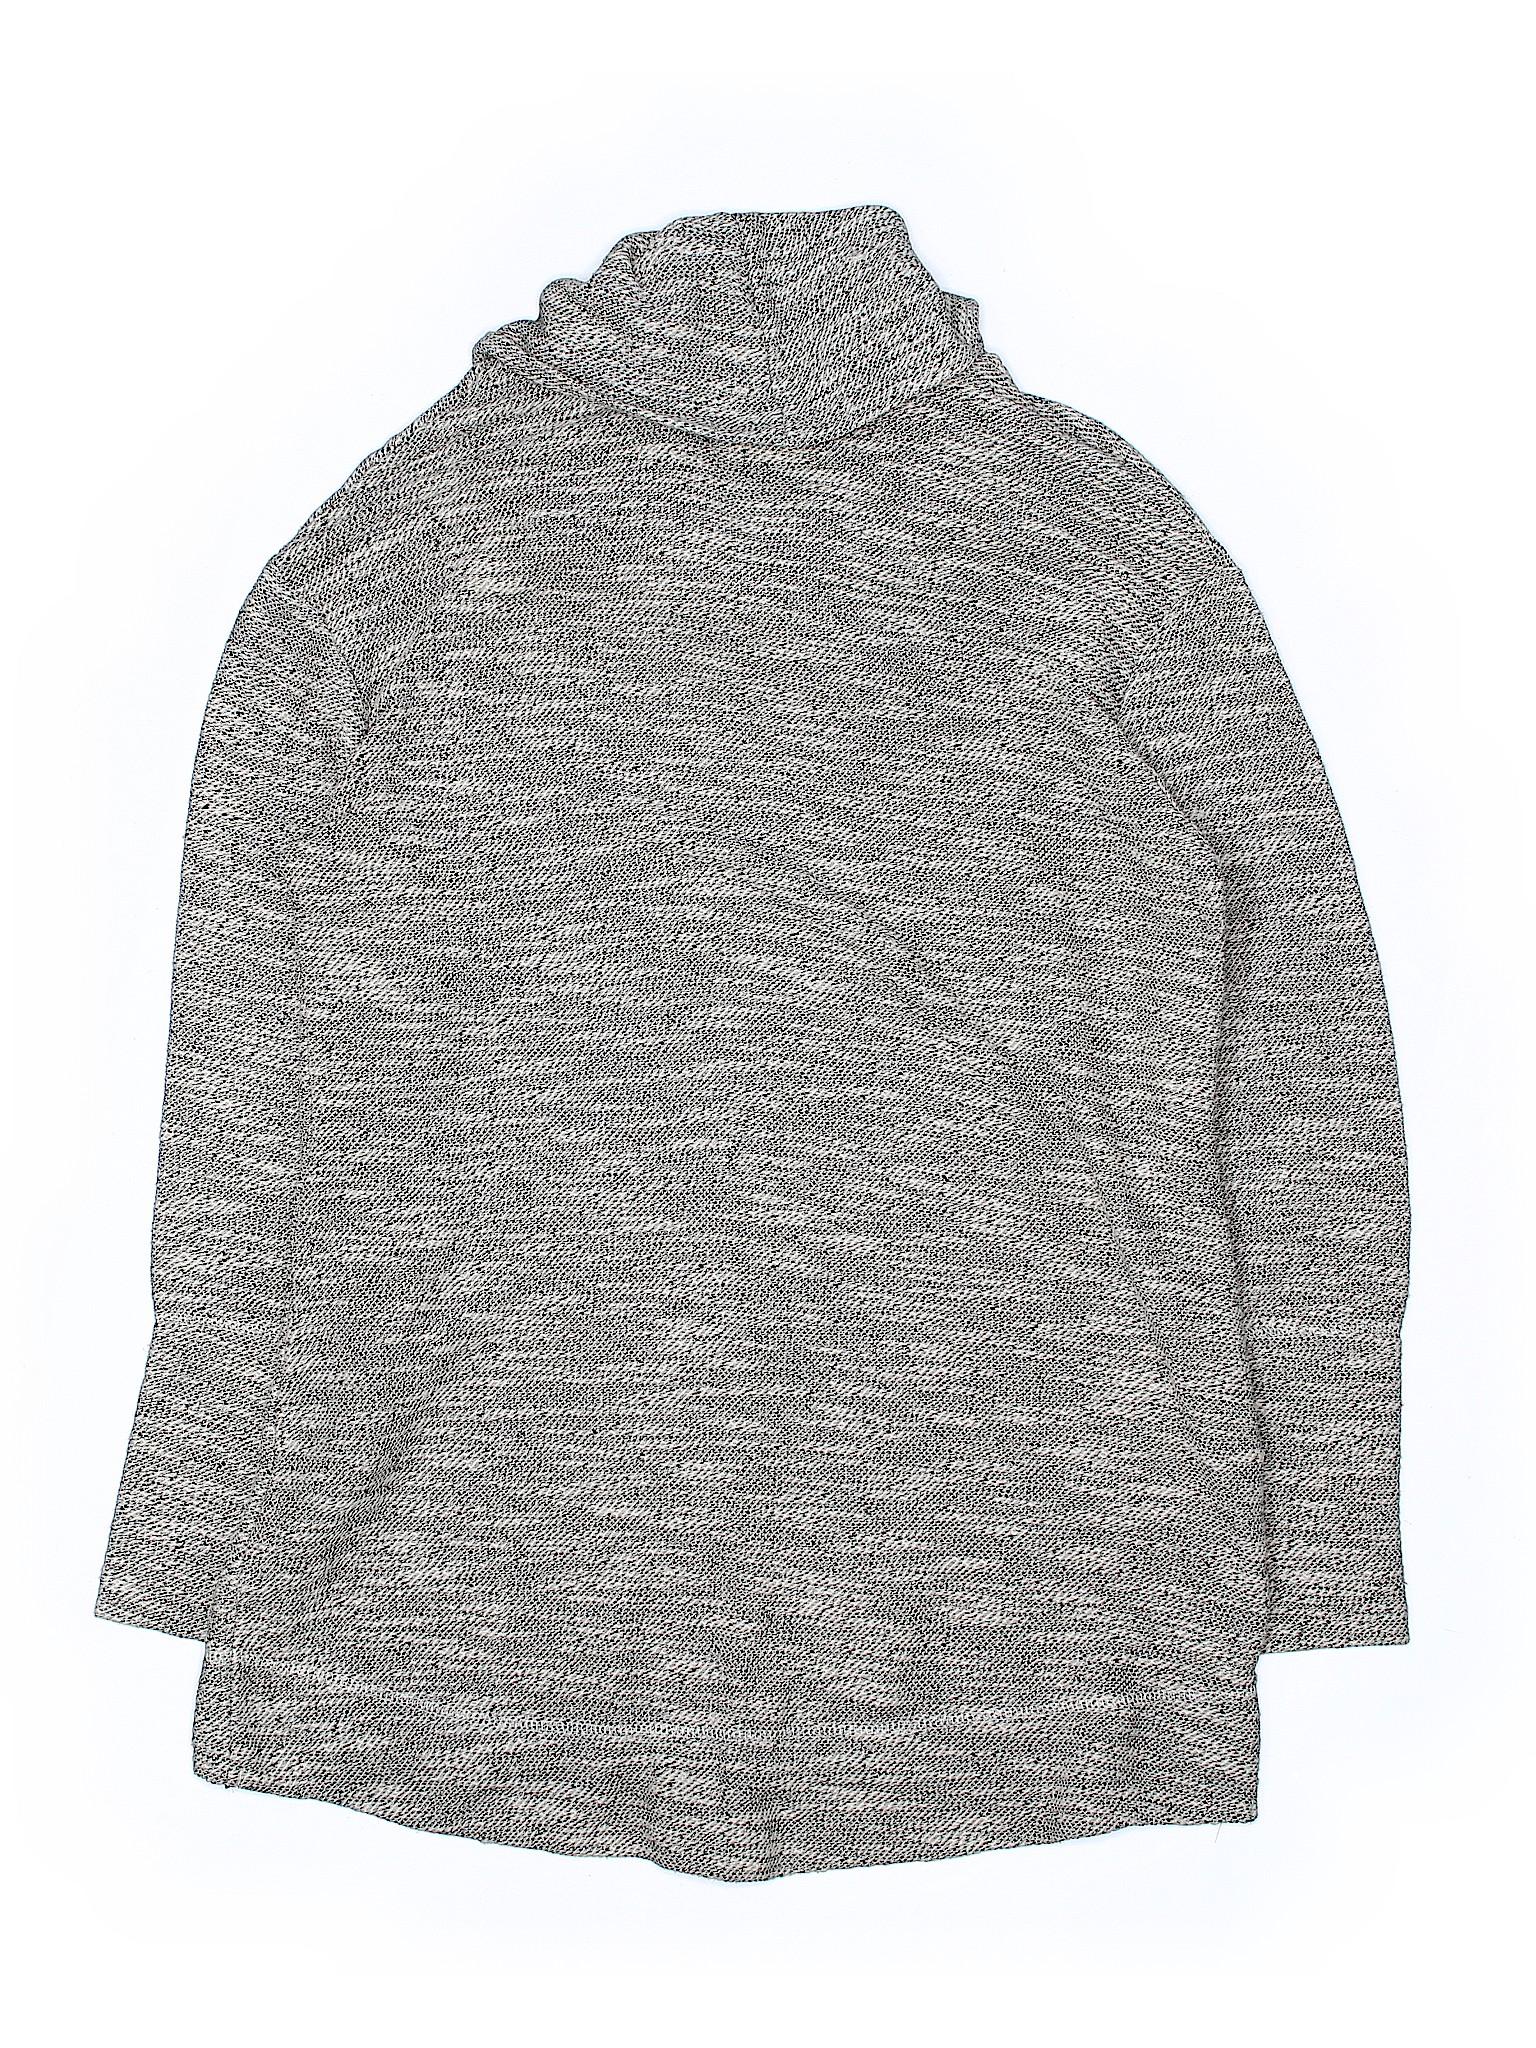 winter Sweater Sweater Boutique winter Pullover Pullover Boutique Sweater Merona winter Merona Merona Boutique Pullover qfwABB